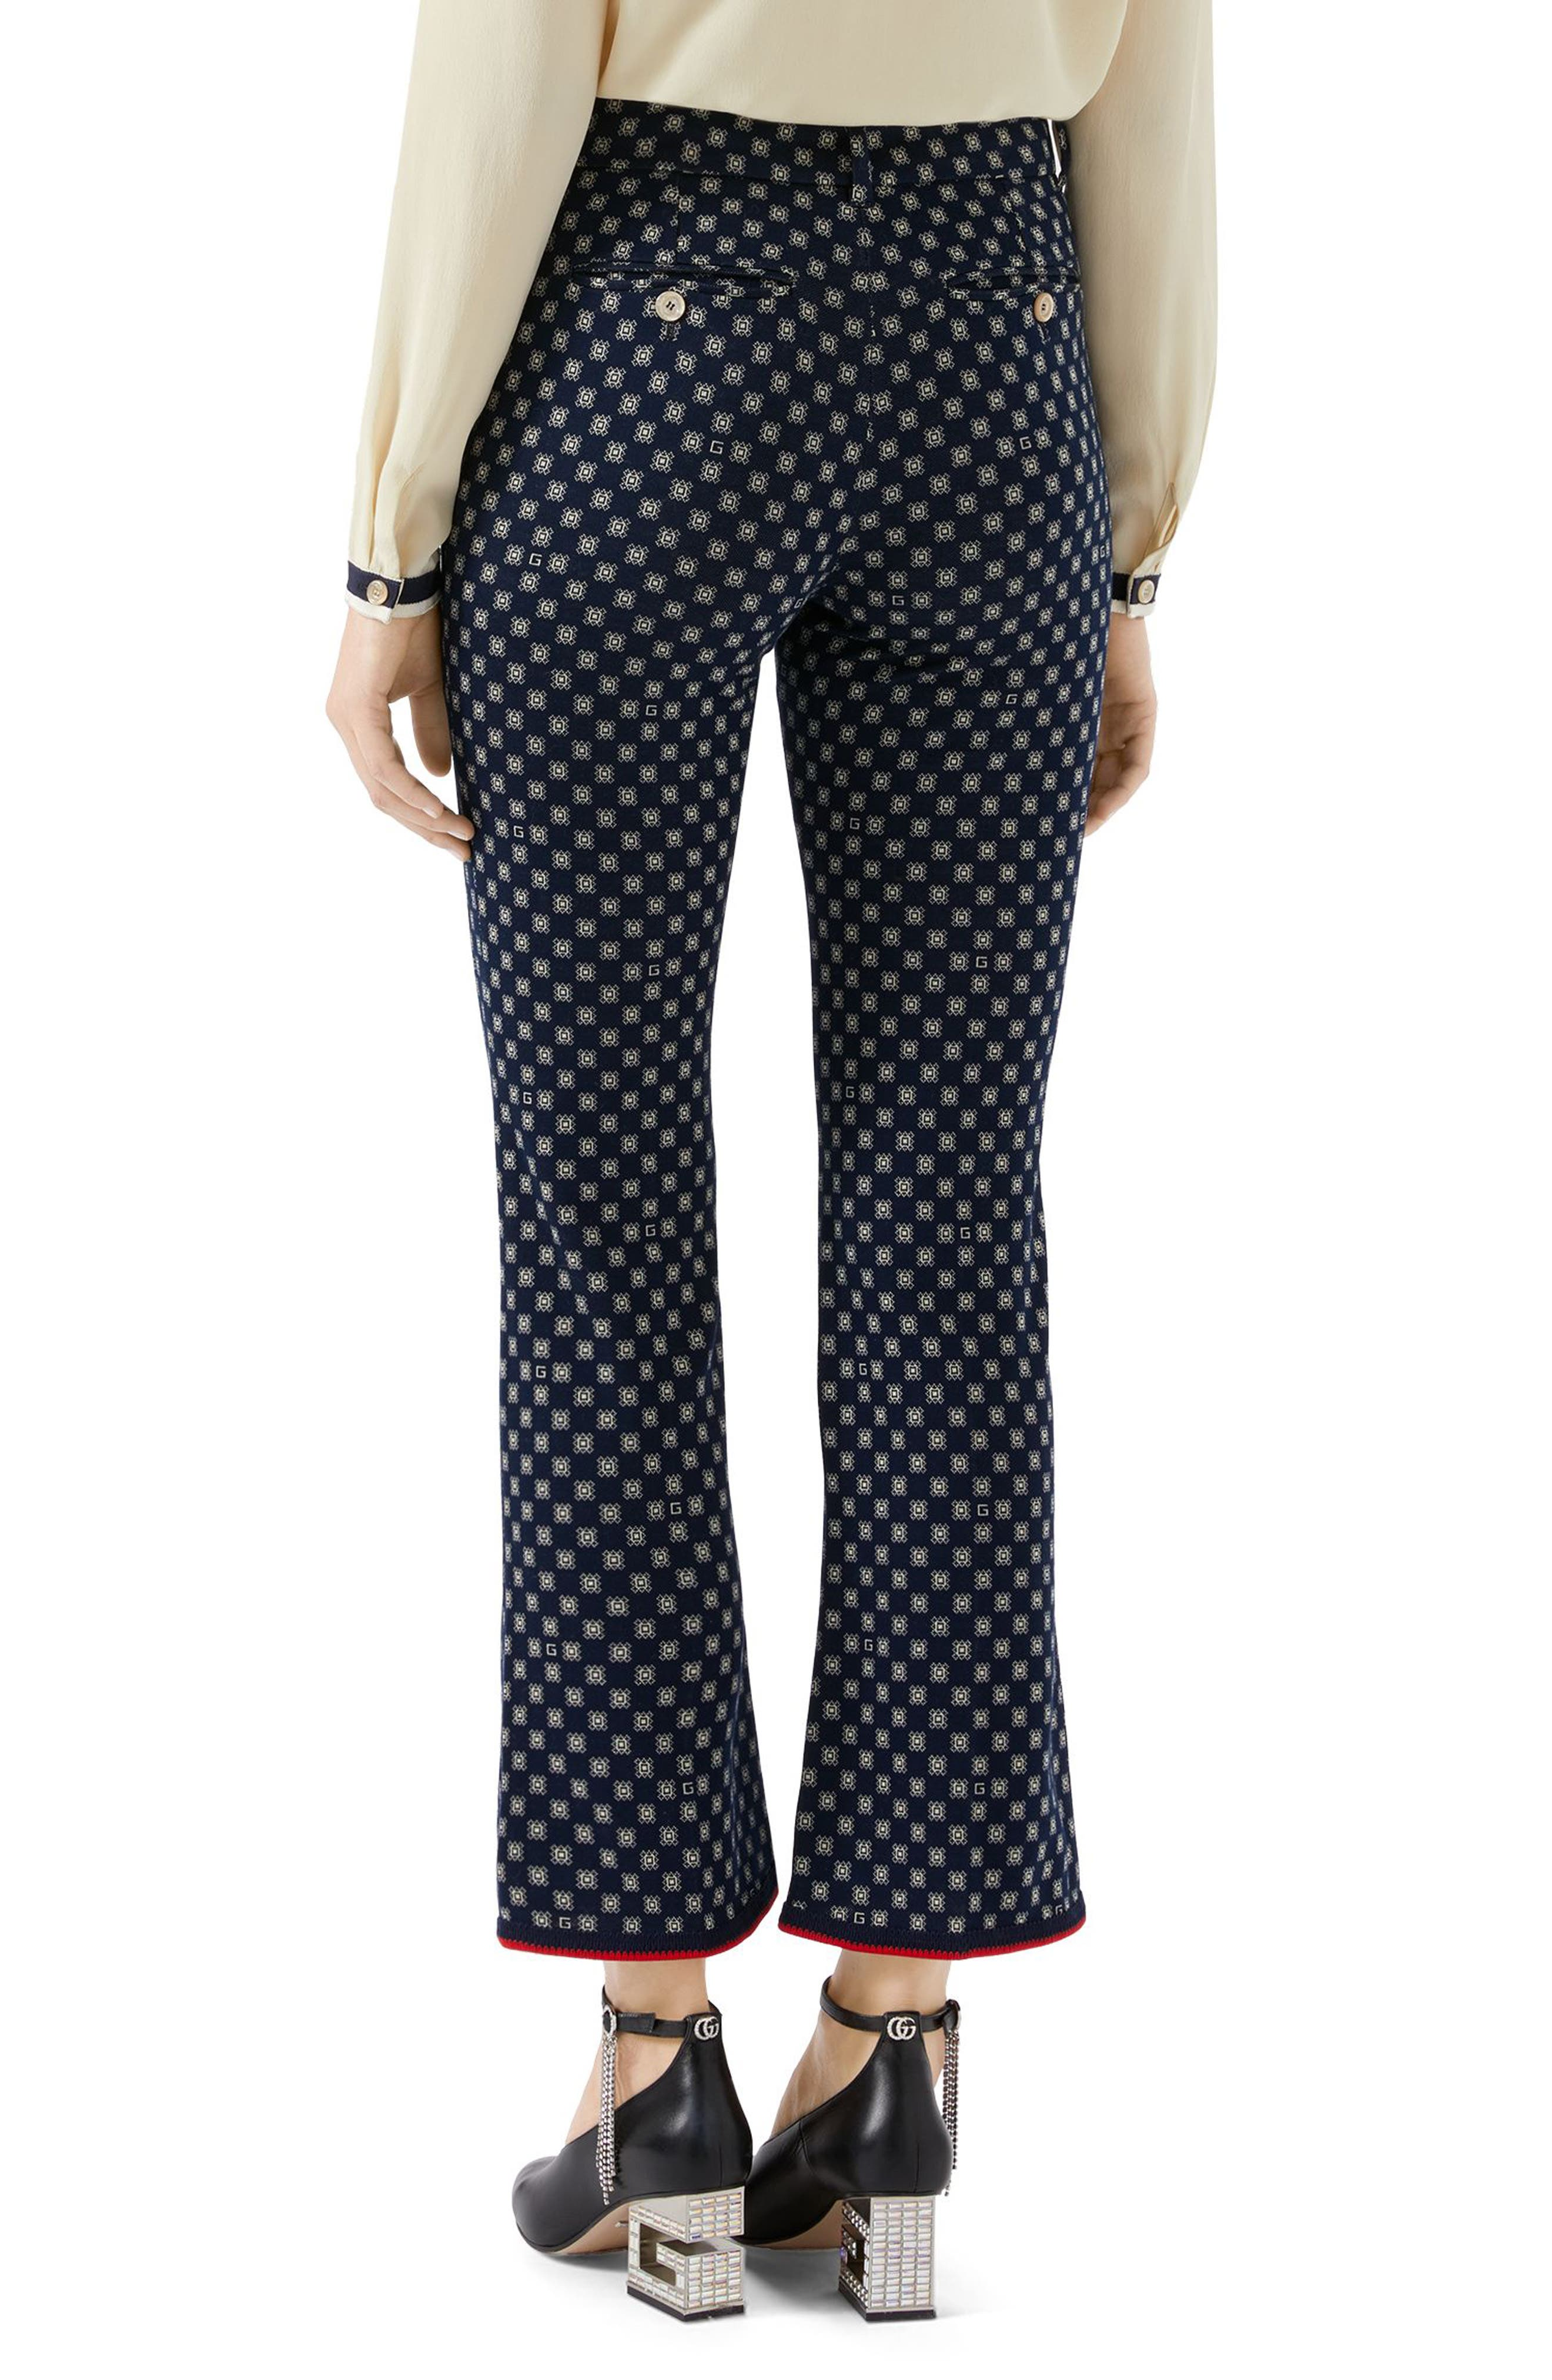 GUCCI,                             G-Frames Jersey Bootcut Pants,                             Alternate thumbnail 2, color,                             4819 CASPIAN/ BEIGE/ MC